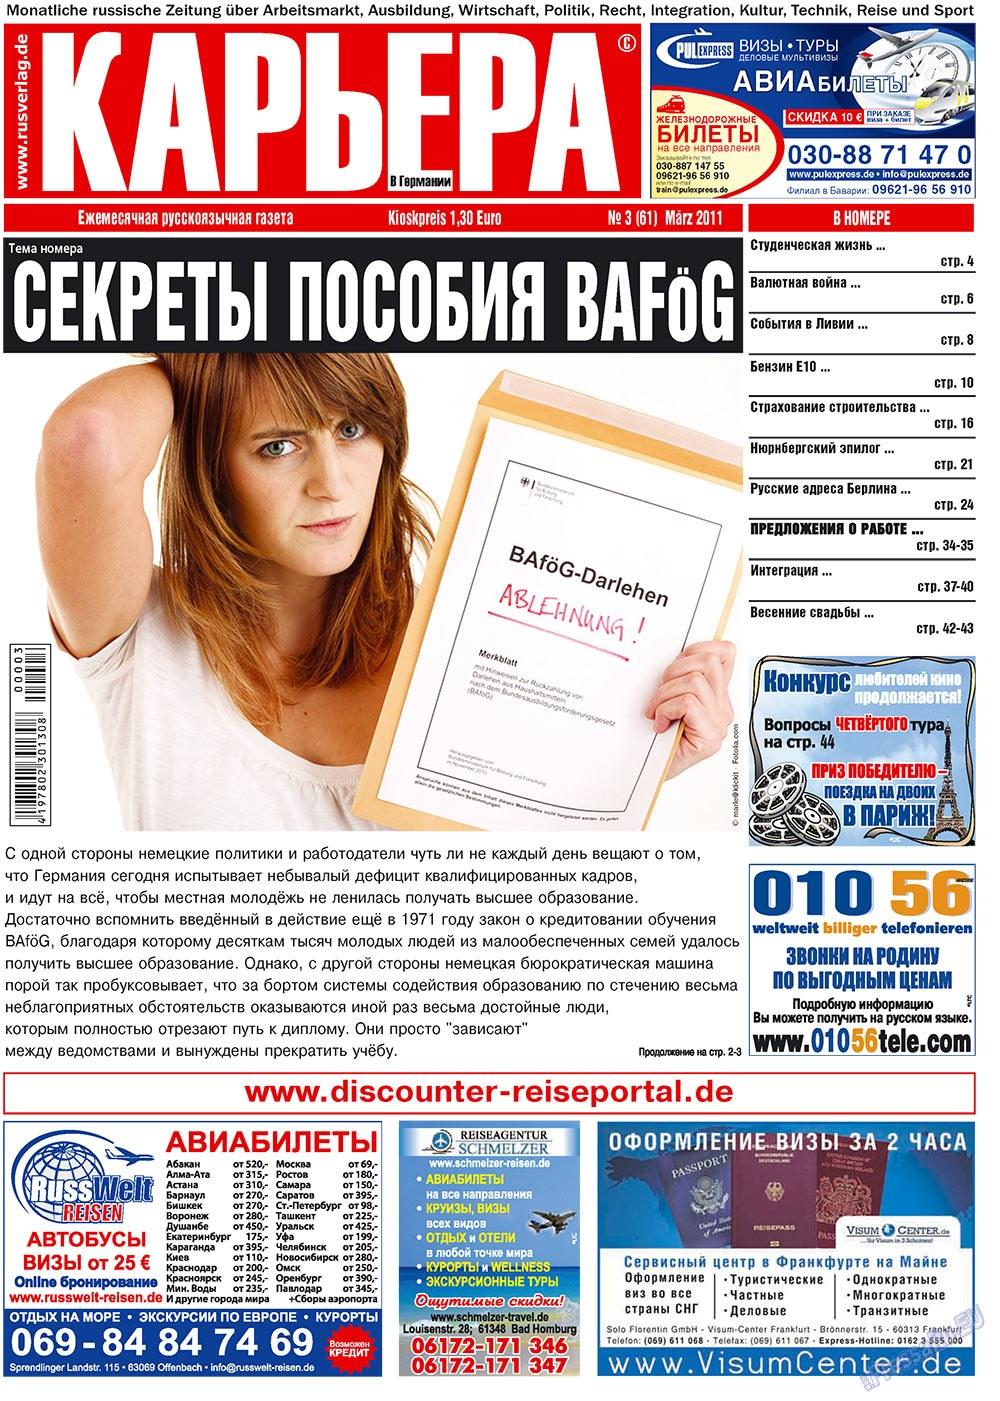 Карьера (газета). 2011 год, номер 3, стр. 1